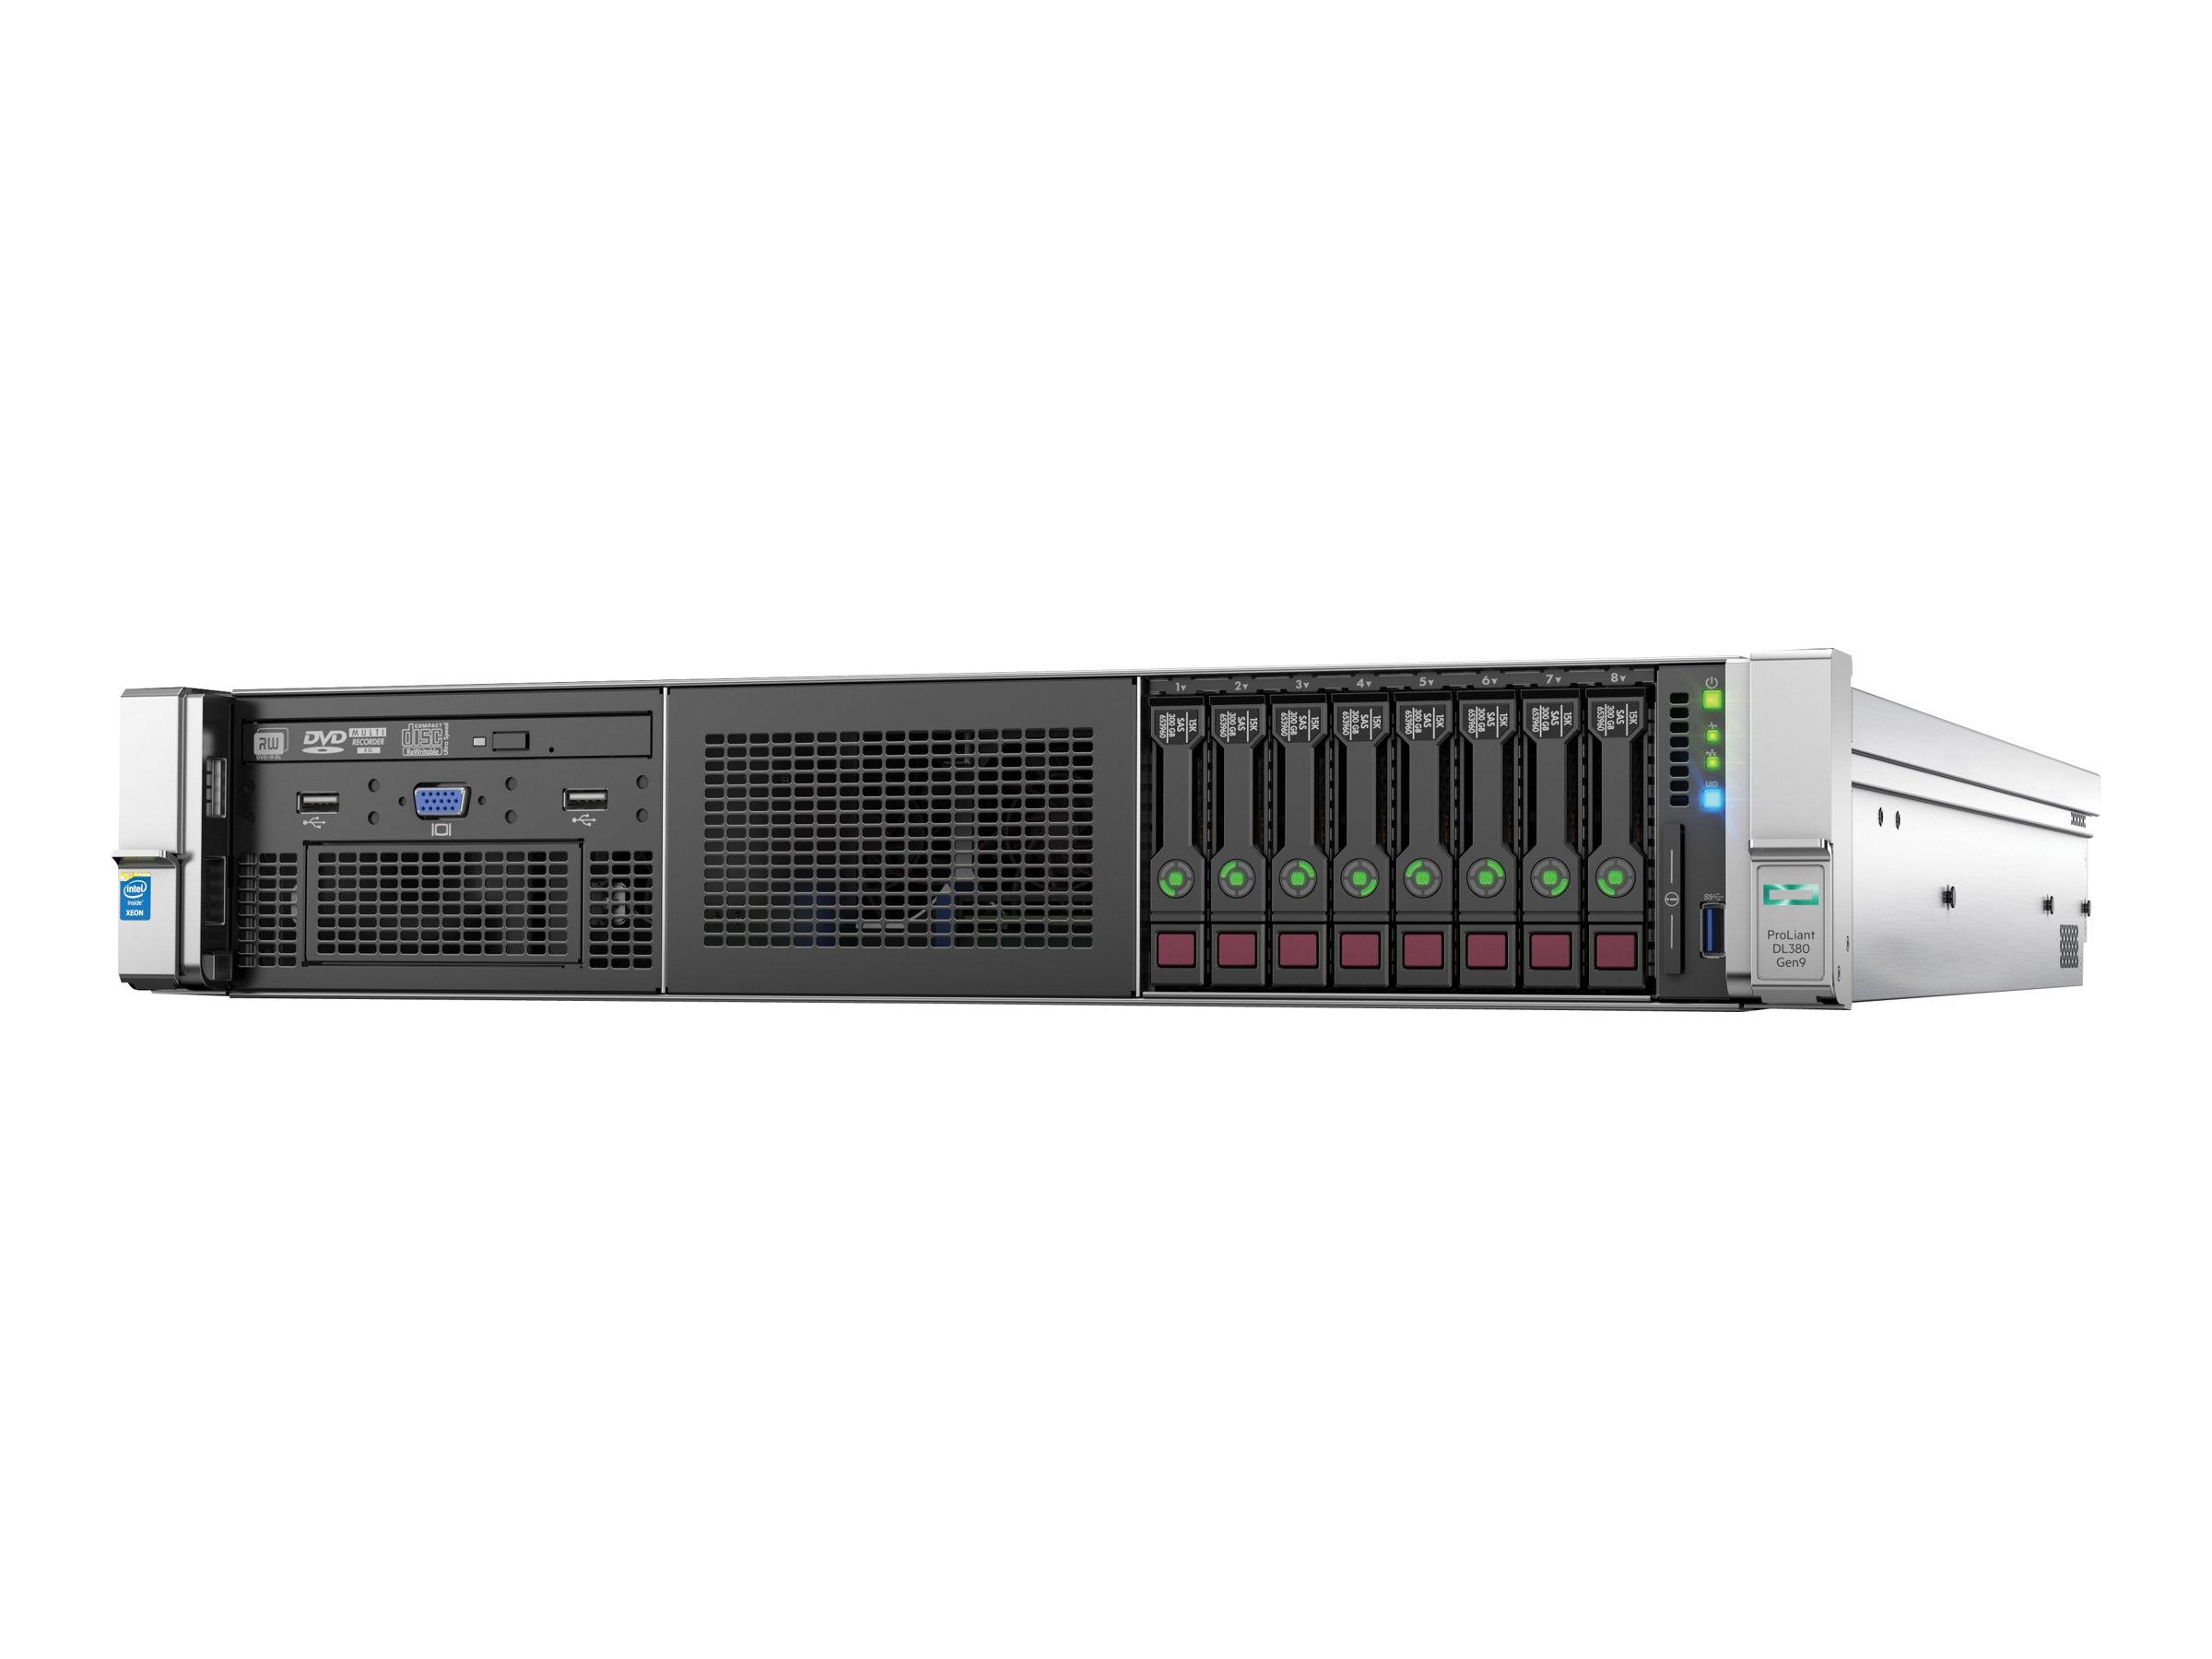 HPE DL380 Gen9 E5-2650v3 2P 32G 8SFF Svr (752689-B21) - RENEW